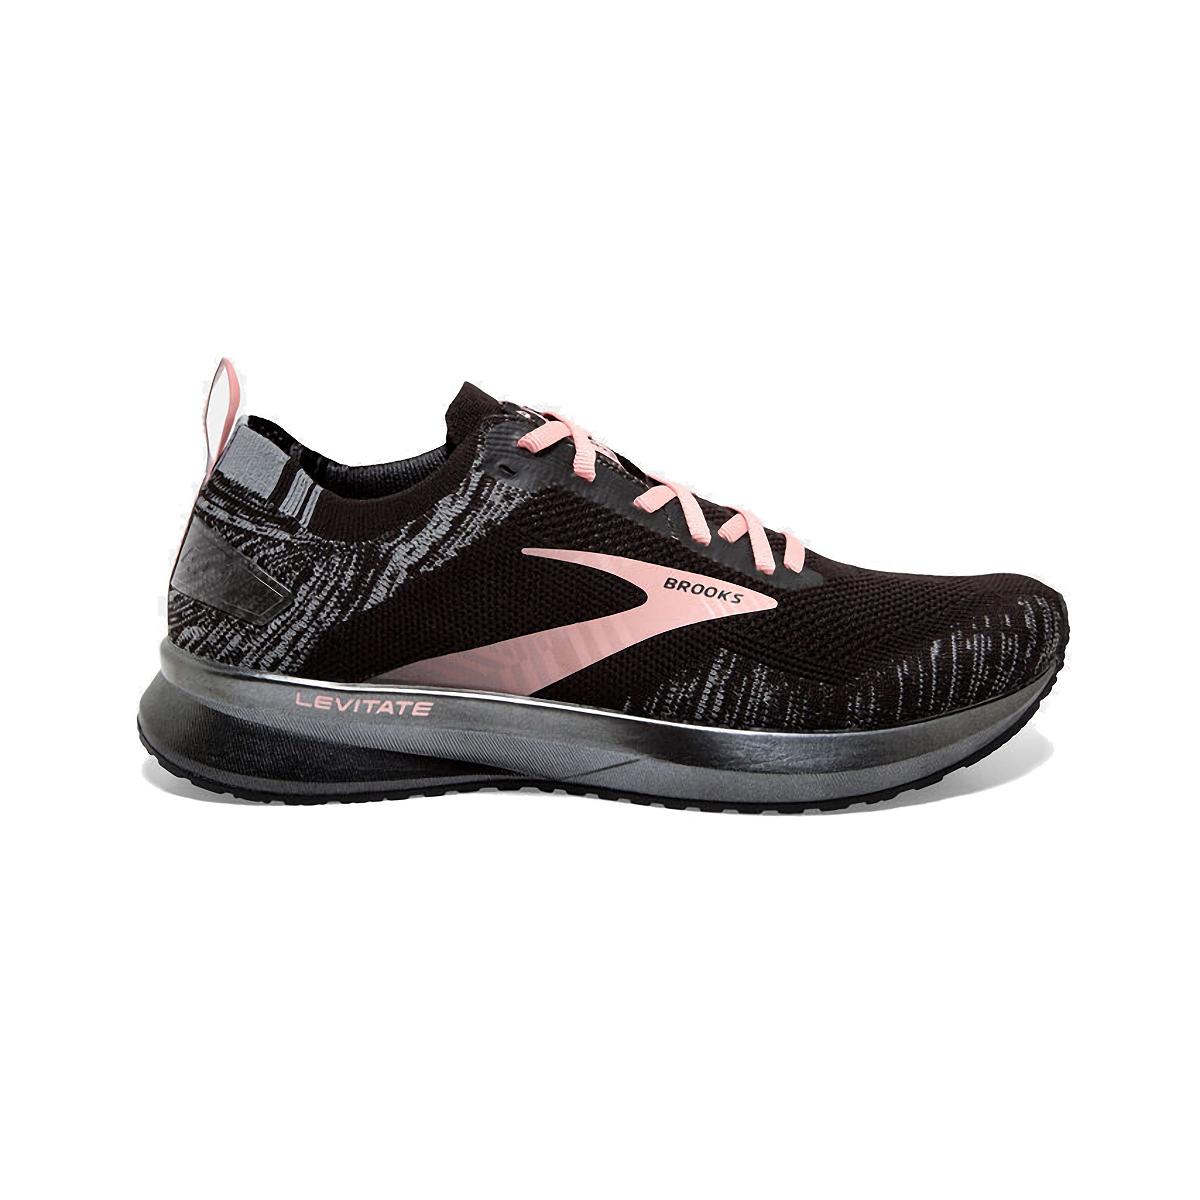 Women's Brooks Levitate 4 Running Shoe - Color: Black/Grey/Coral - Size: 5 - Width: Regular, Black/Grey/Coral, large, image 1